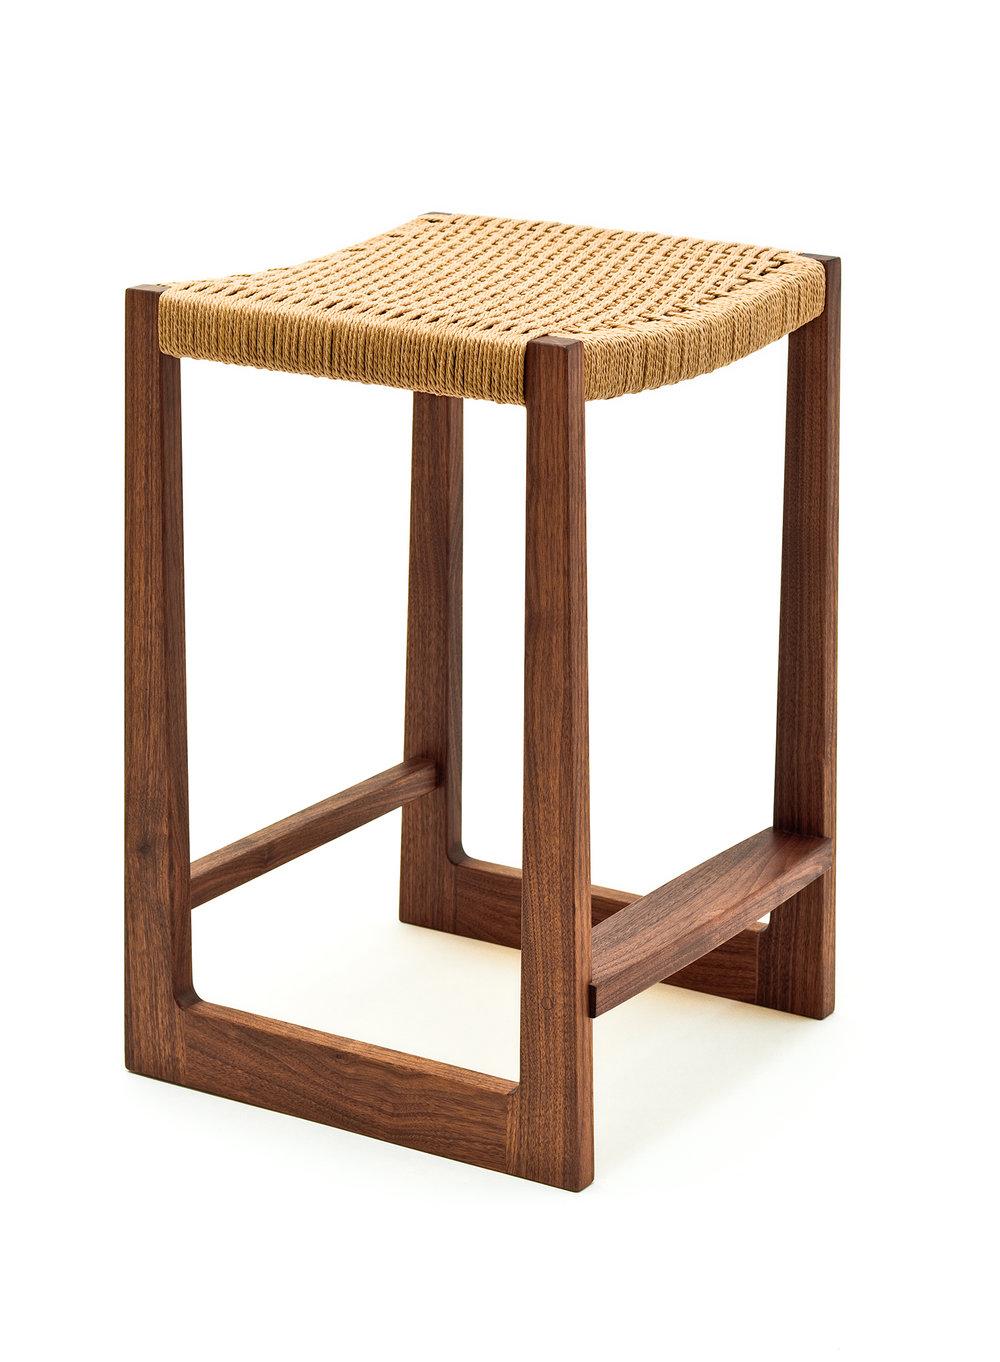 Tall Matteawan stool in walnut with natural Danish cord